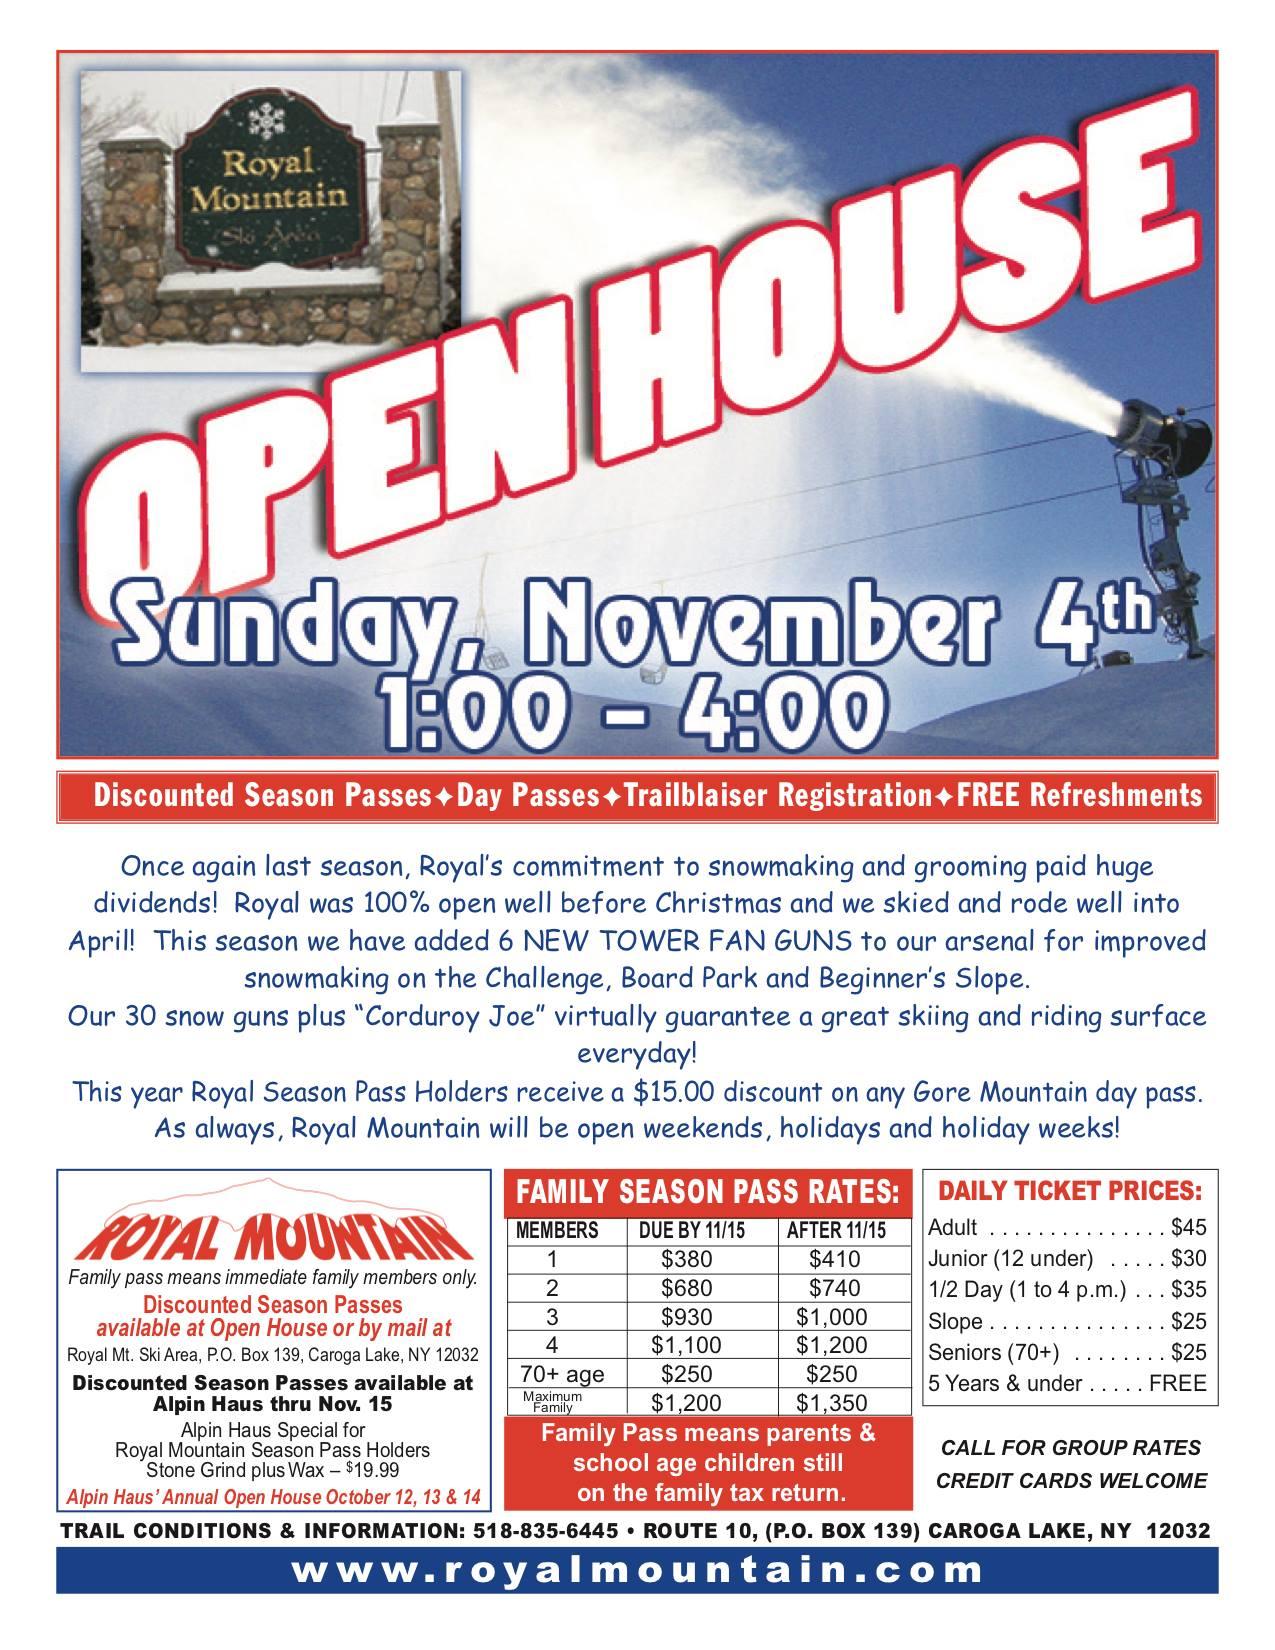 Open House - November 4th